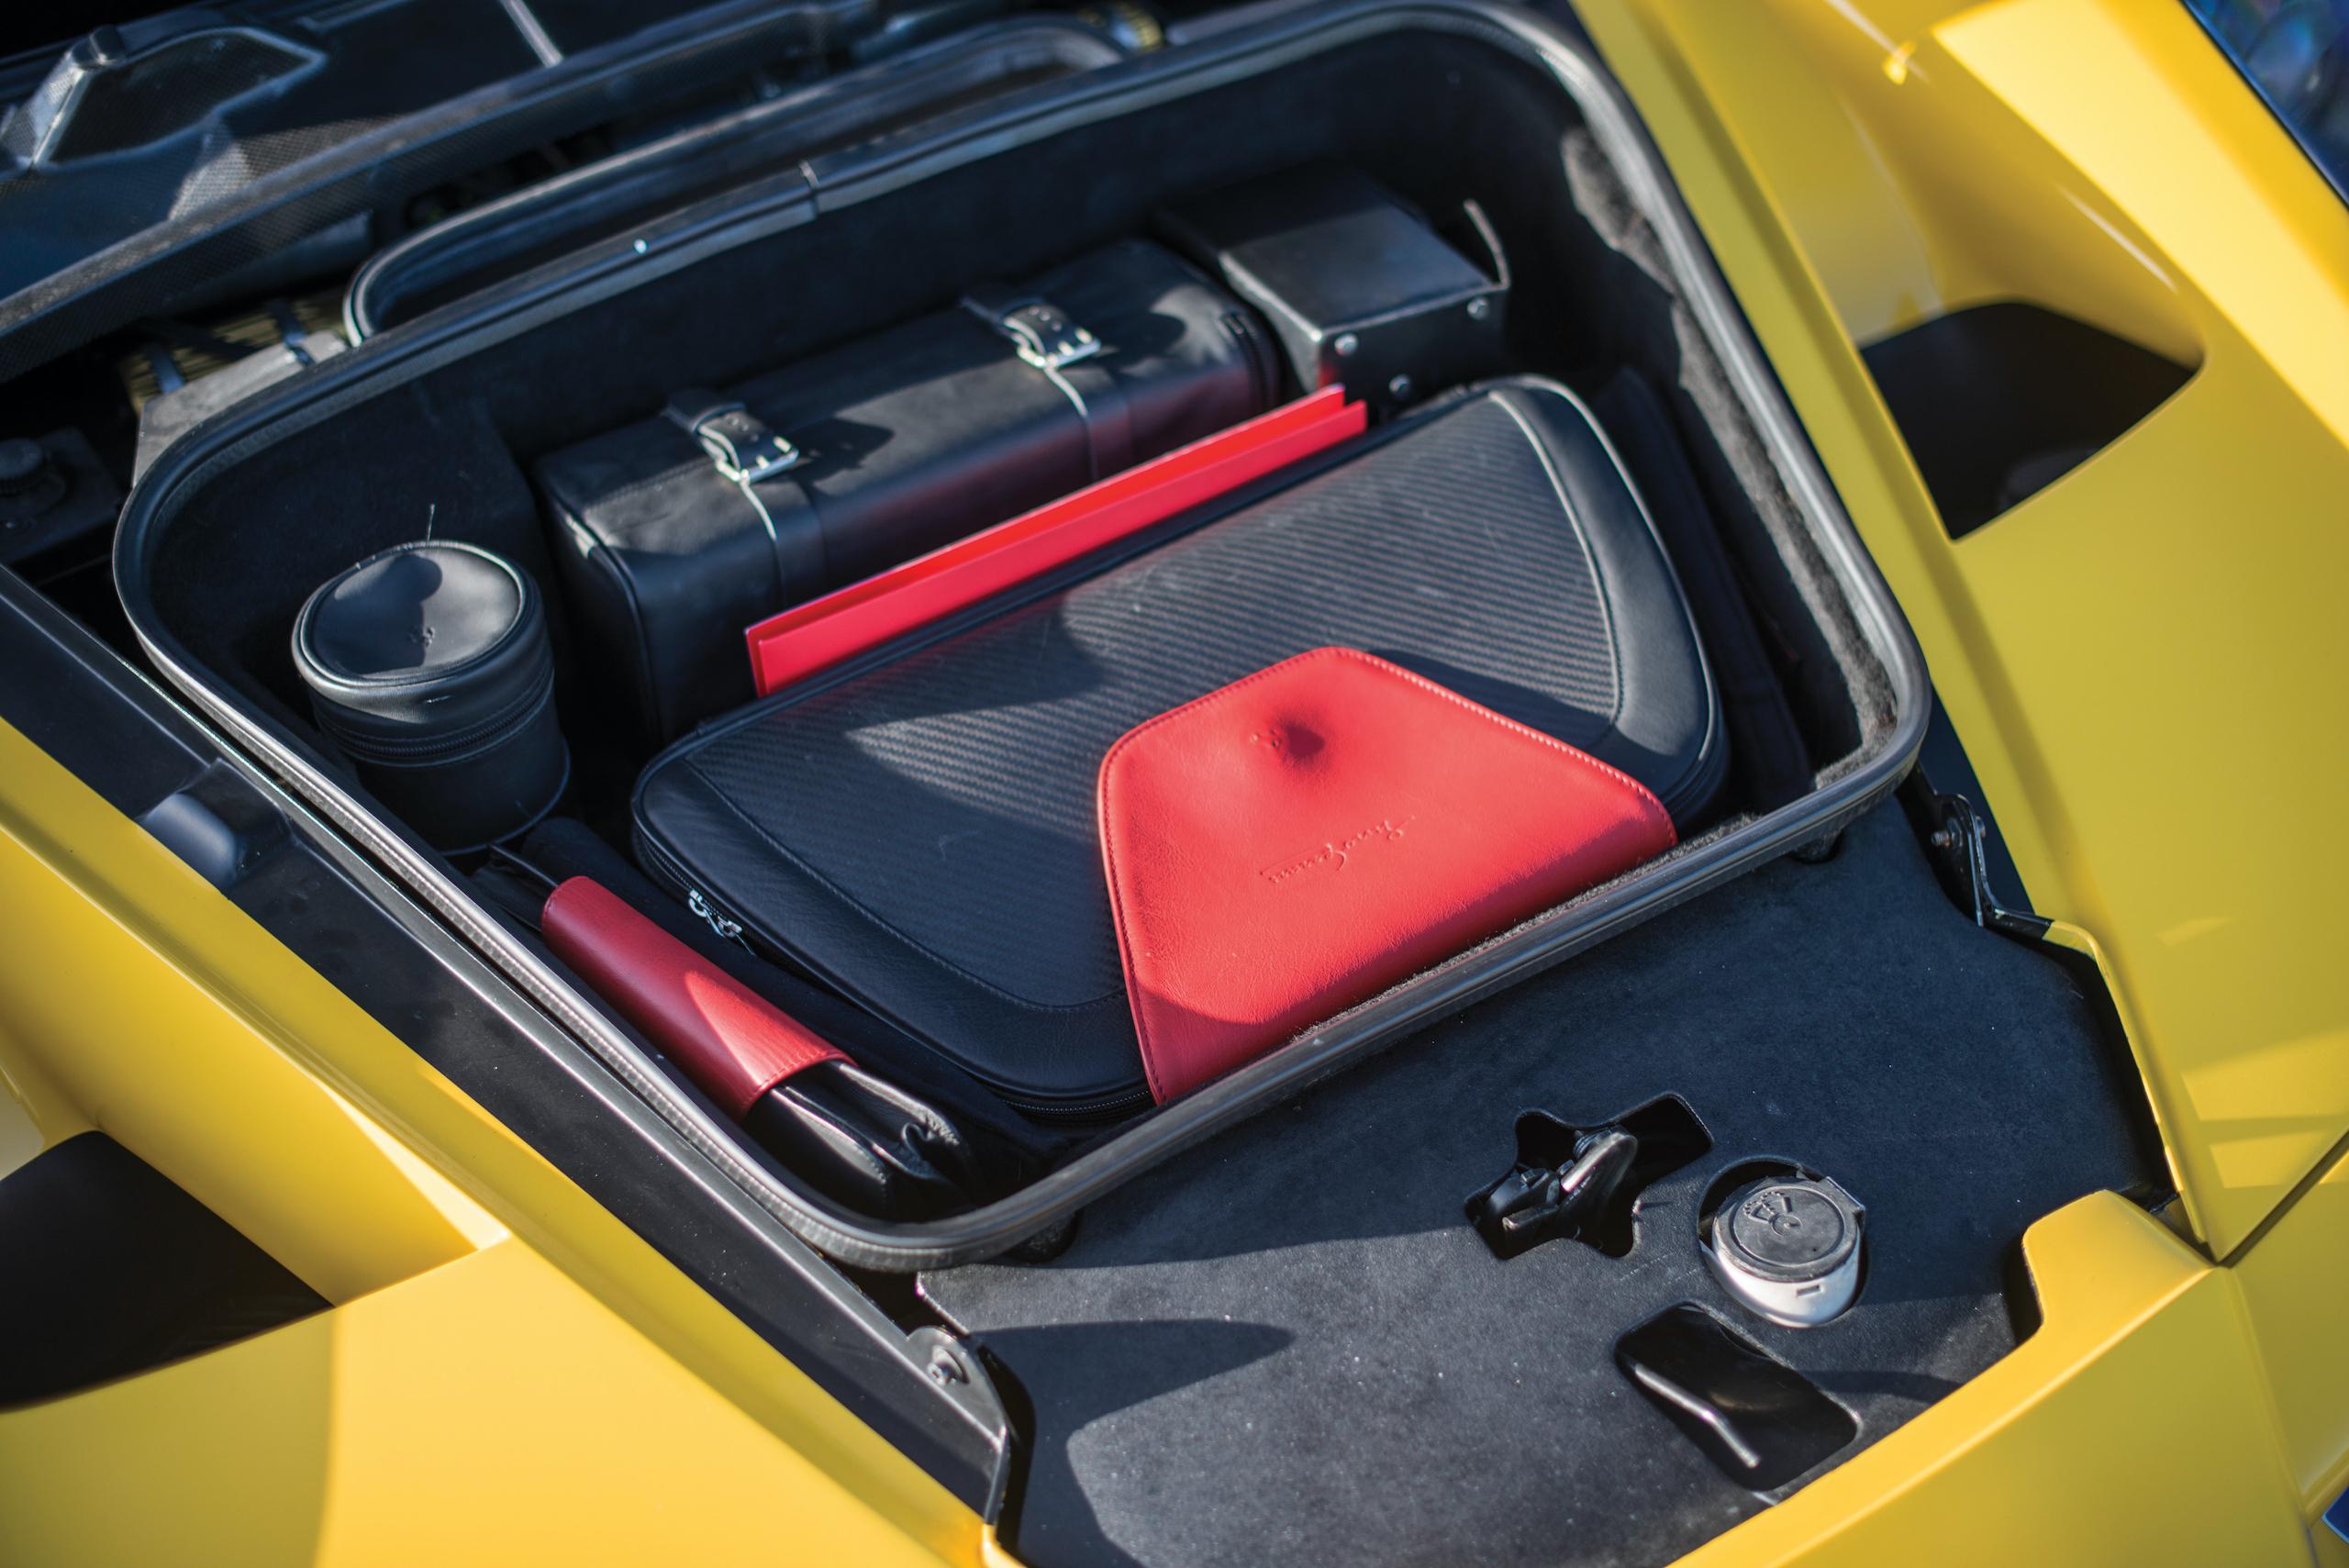 2002 Ferrari Enzo front trunk accessories